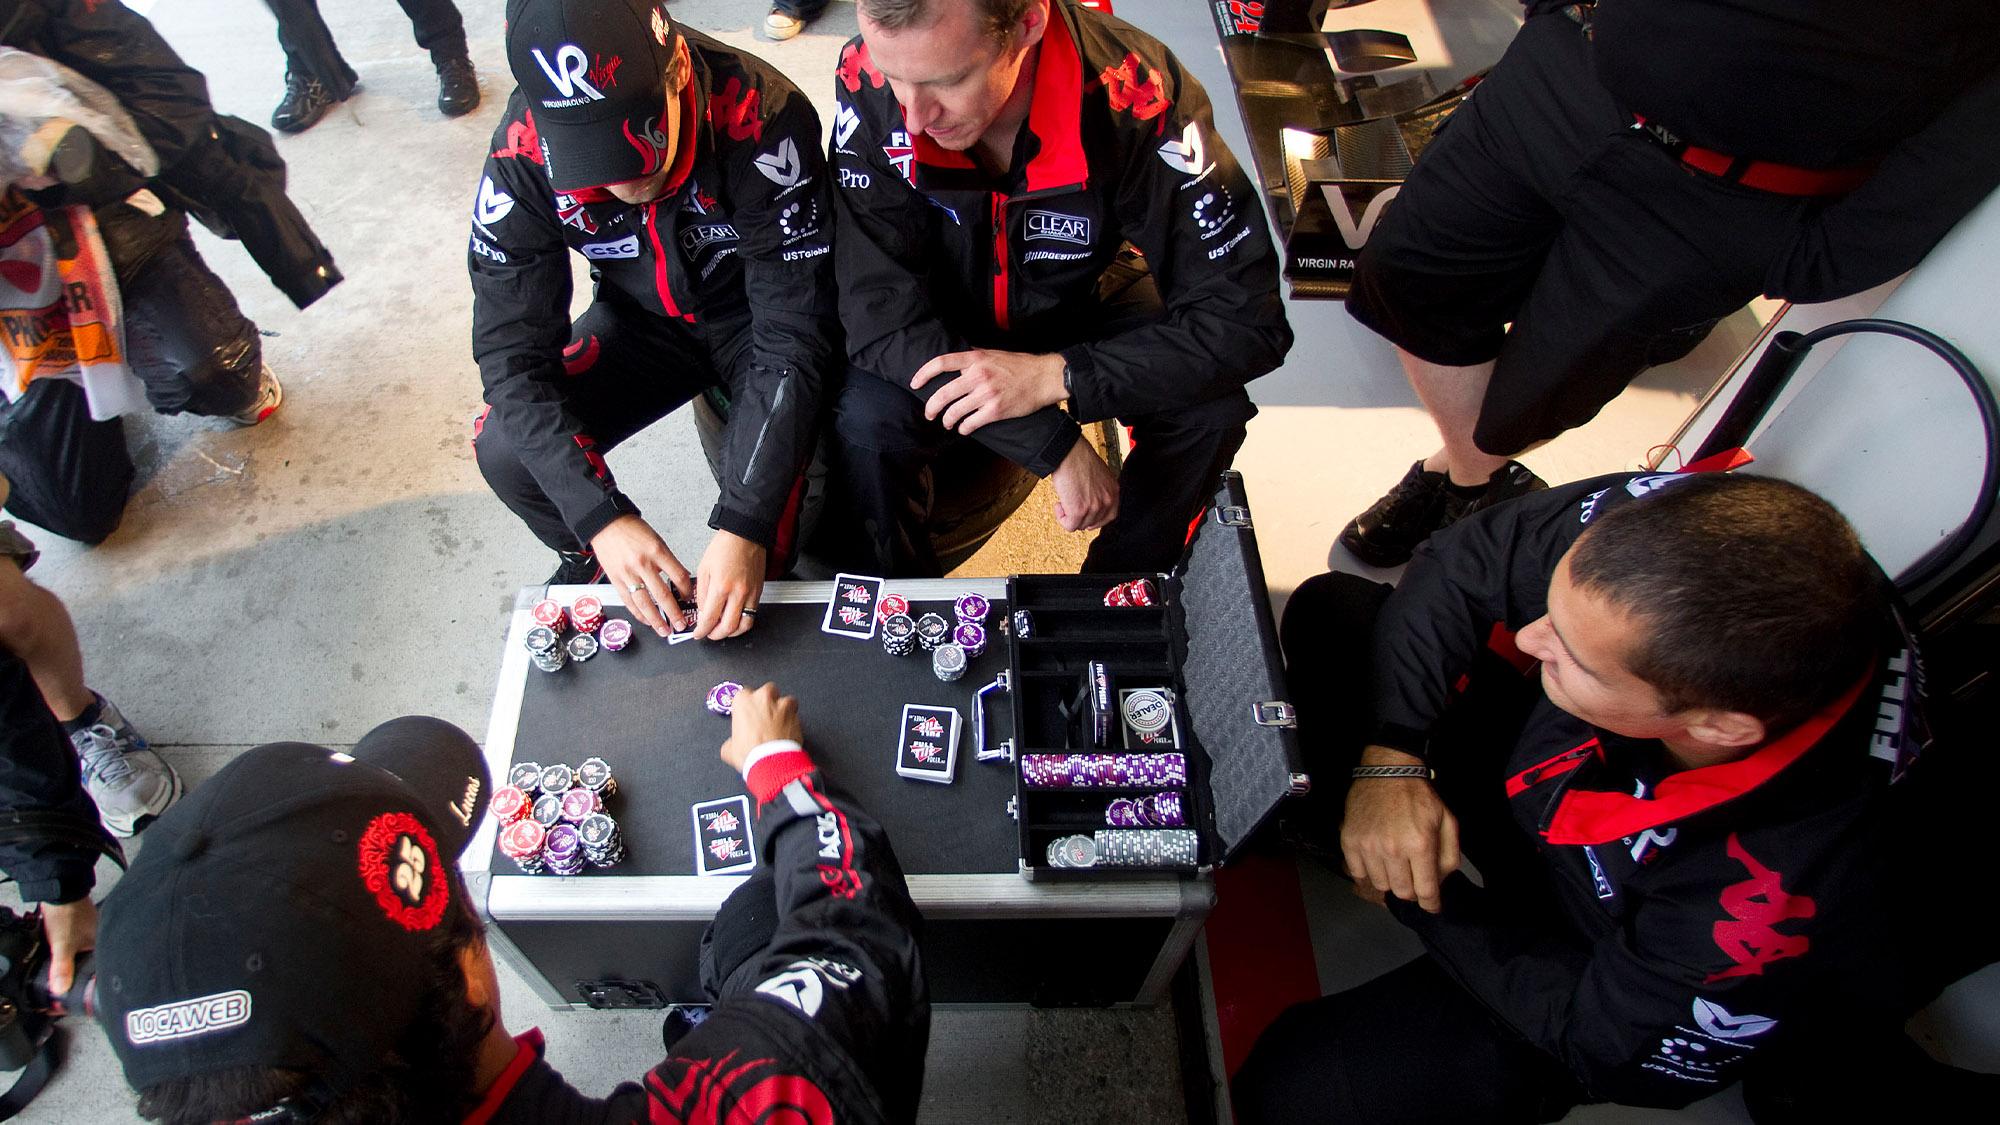 Virgin racing drivers play poker at the 2010 Japanese Grand Prix